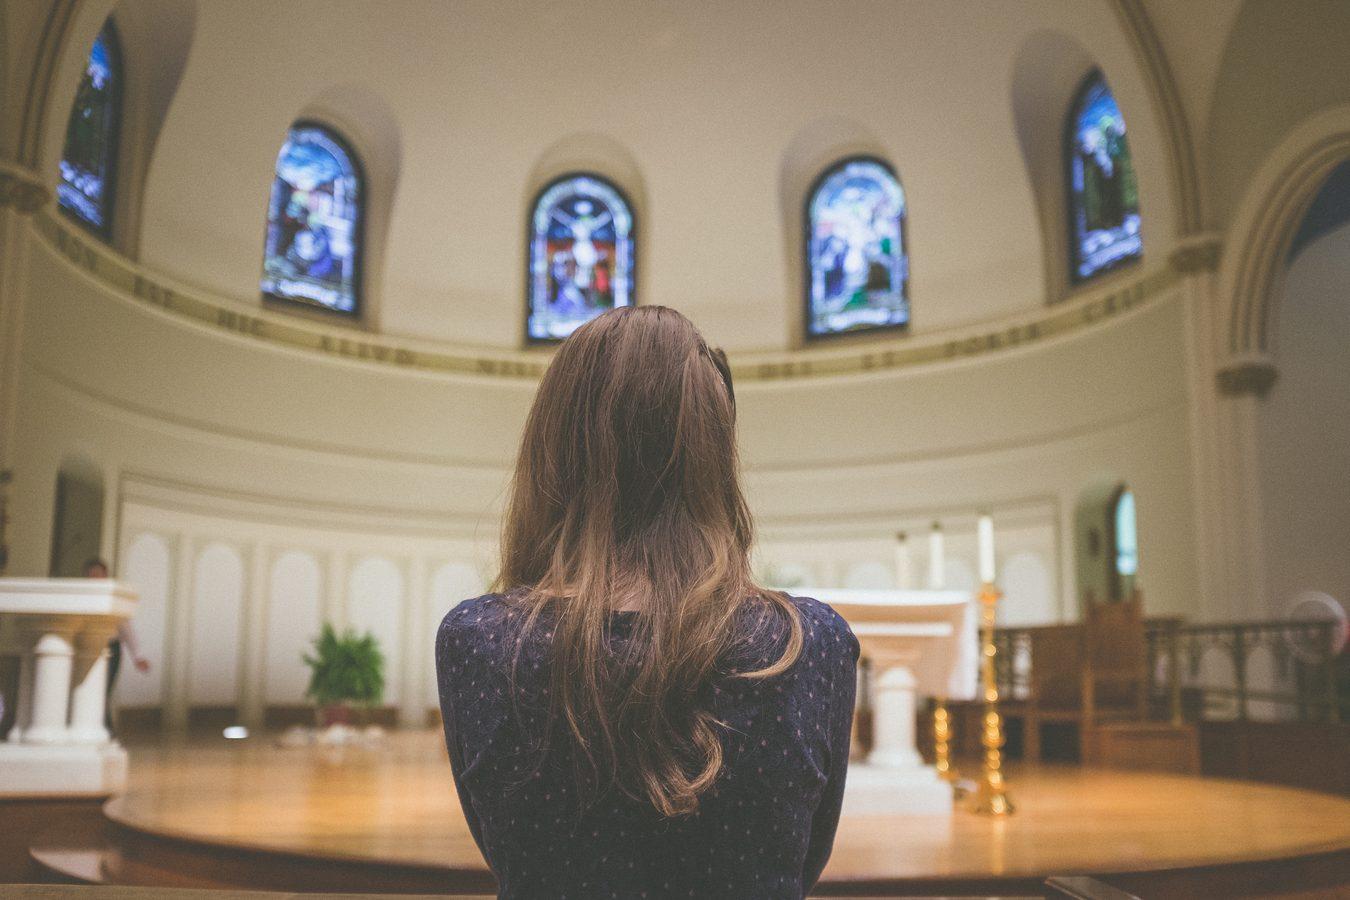 https://www.americamagazine.org/women-church-2018